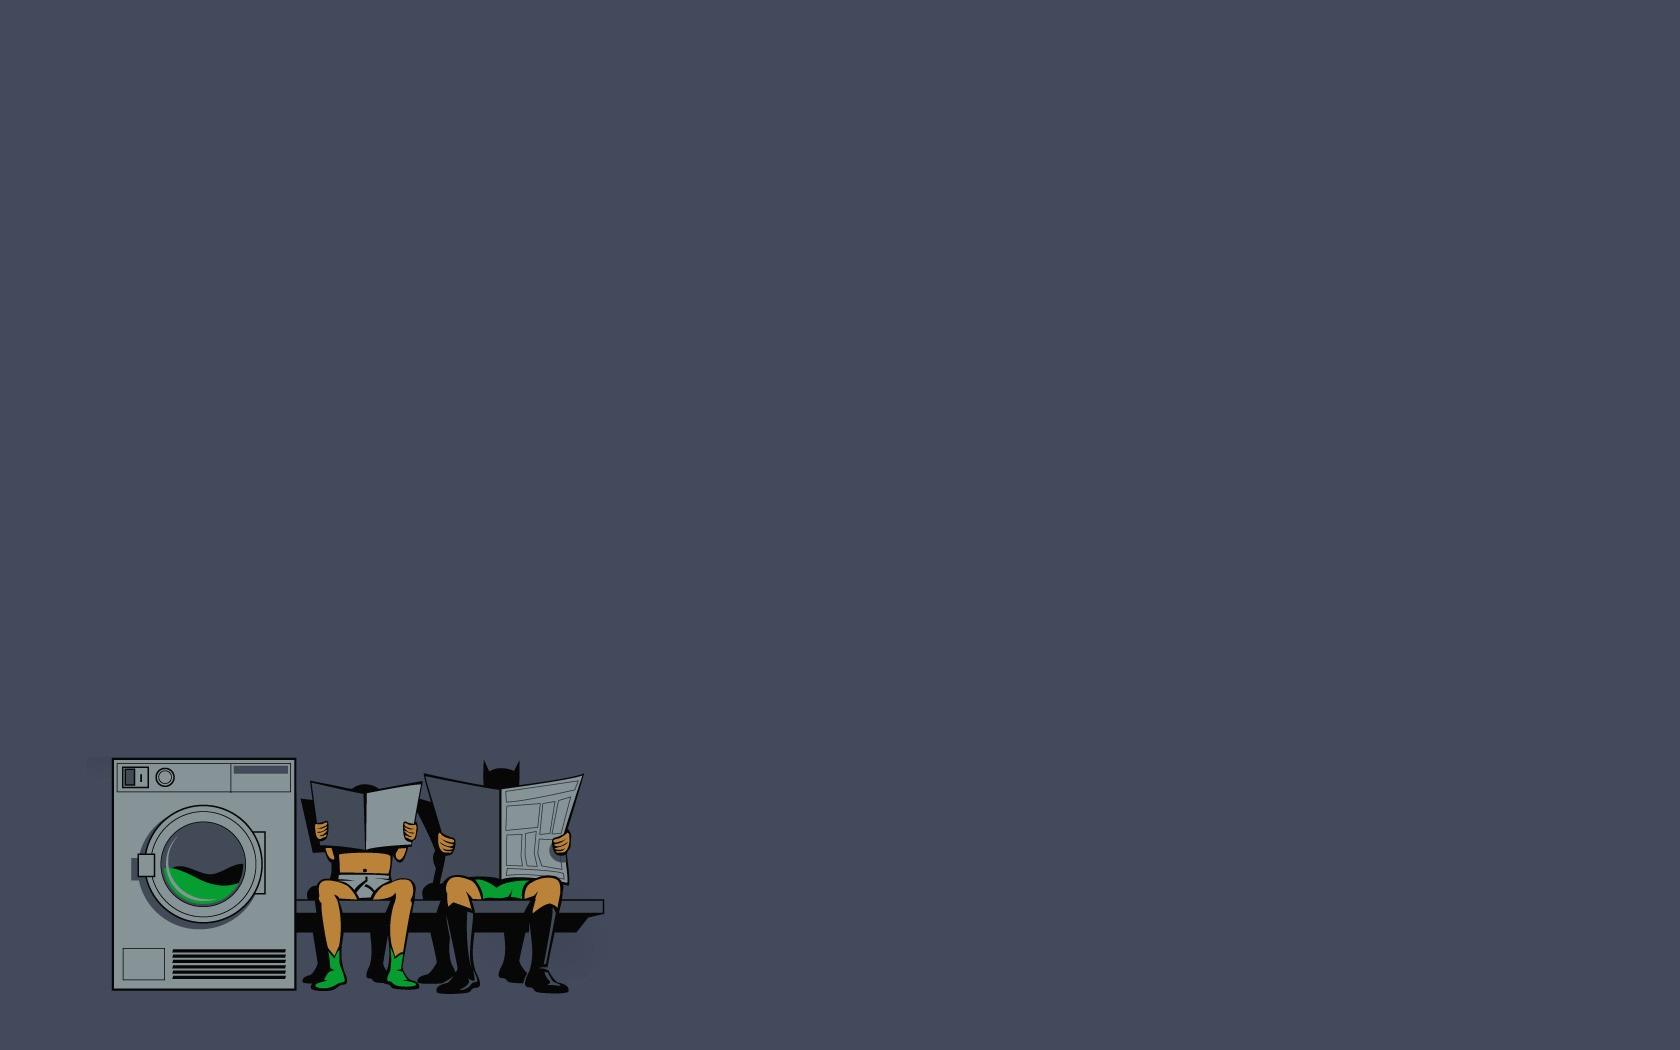 Motivational Quotes Wallpaper For Mobile Digital Art Simple Background Minimalism Batman Humor